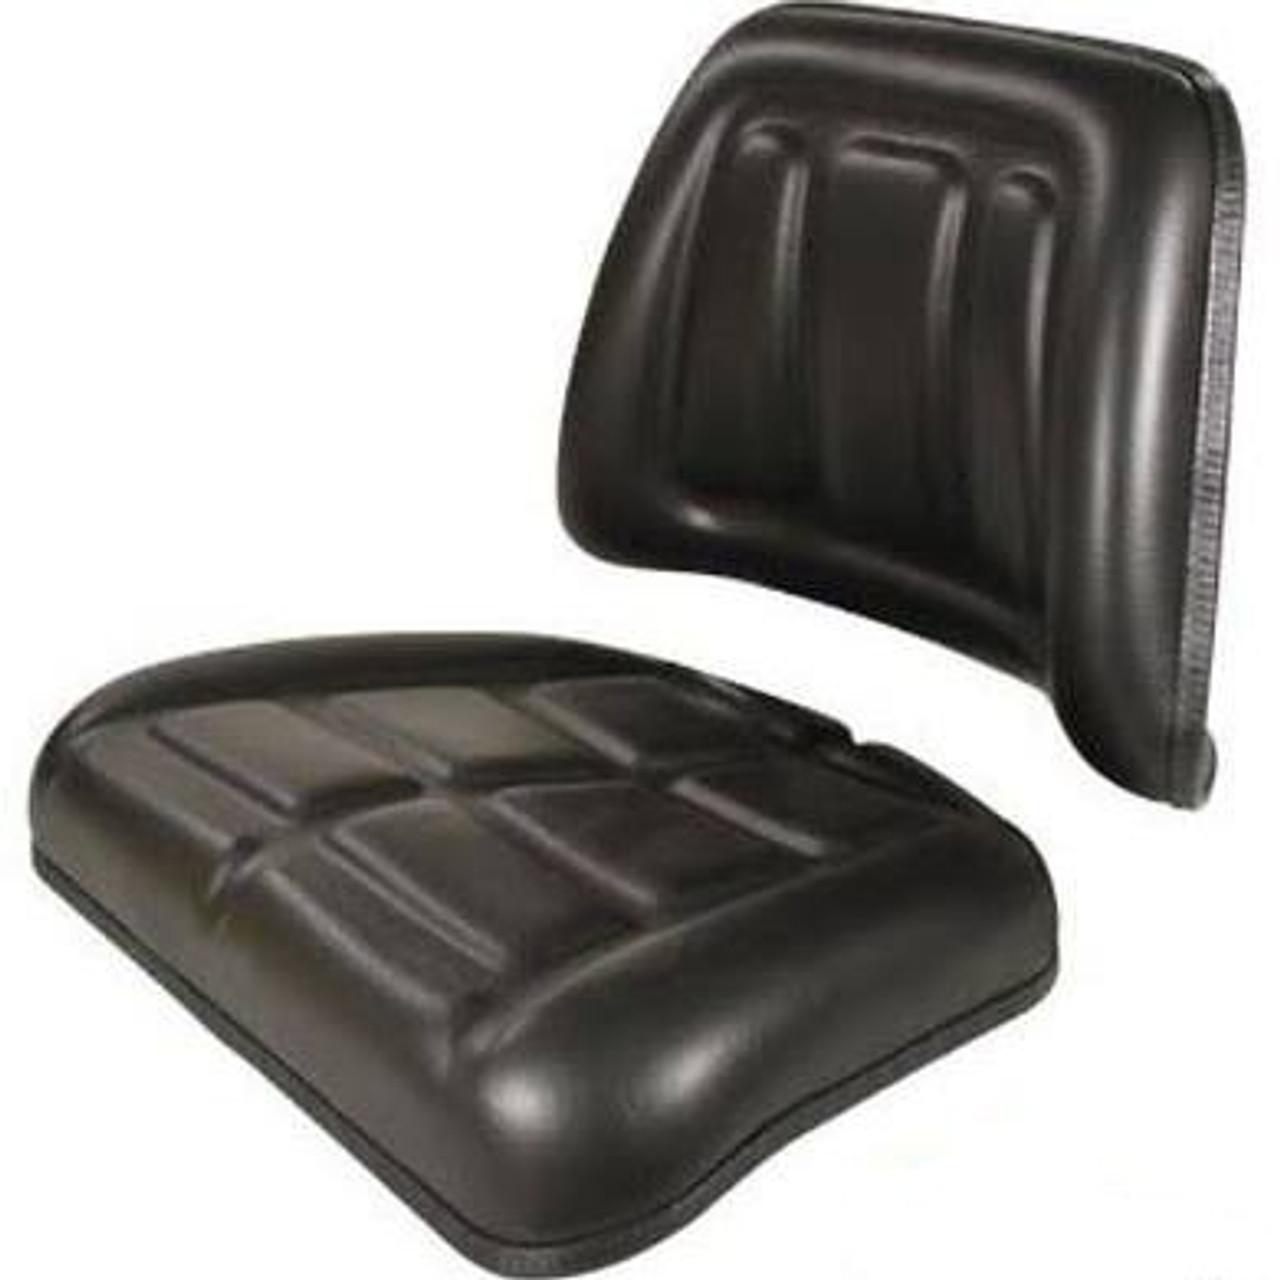 MF Black Seat Cushion Set Fits 20E 20F 30E 40E 50E 240 253 3102795m1 3102796m1